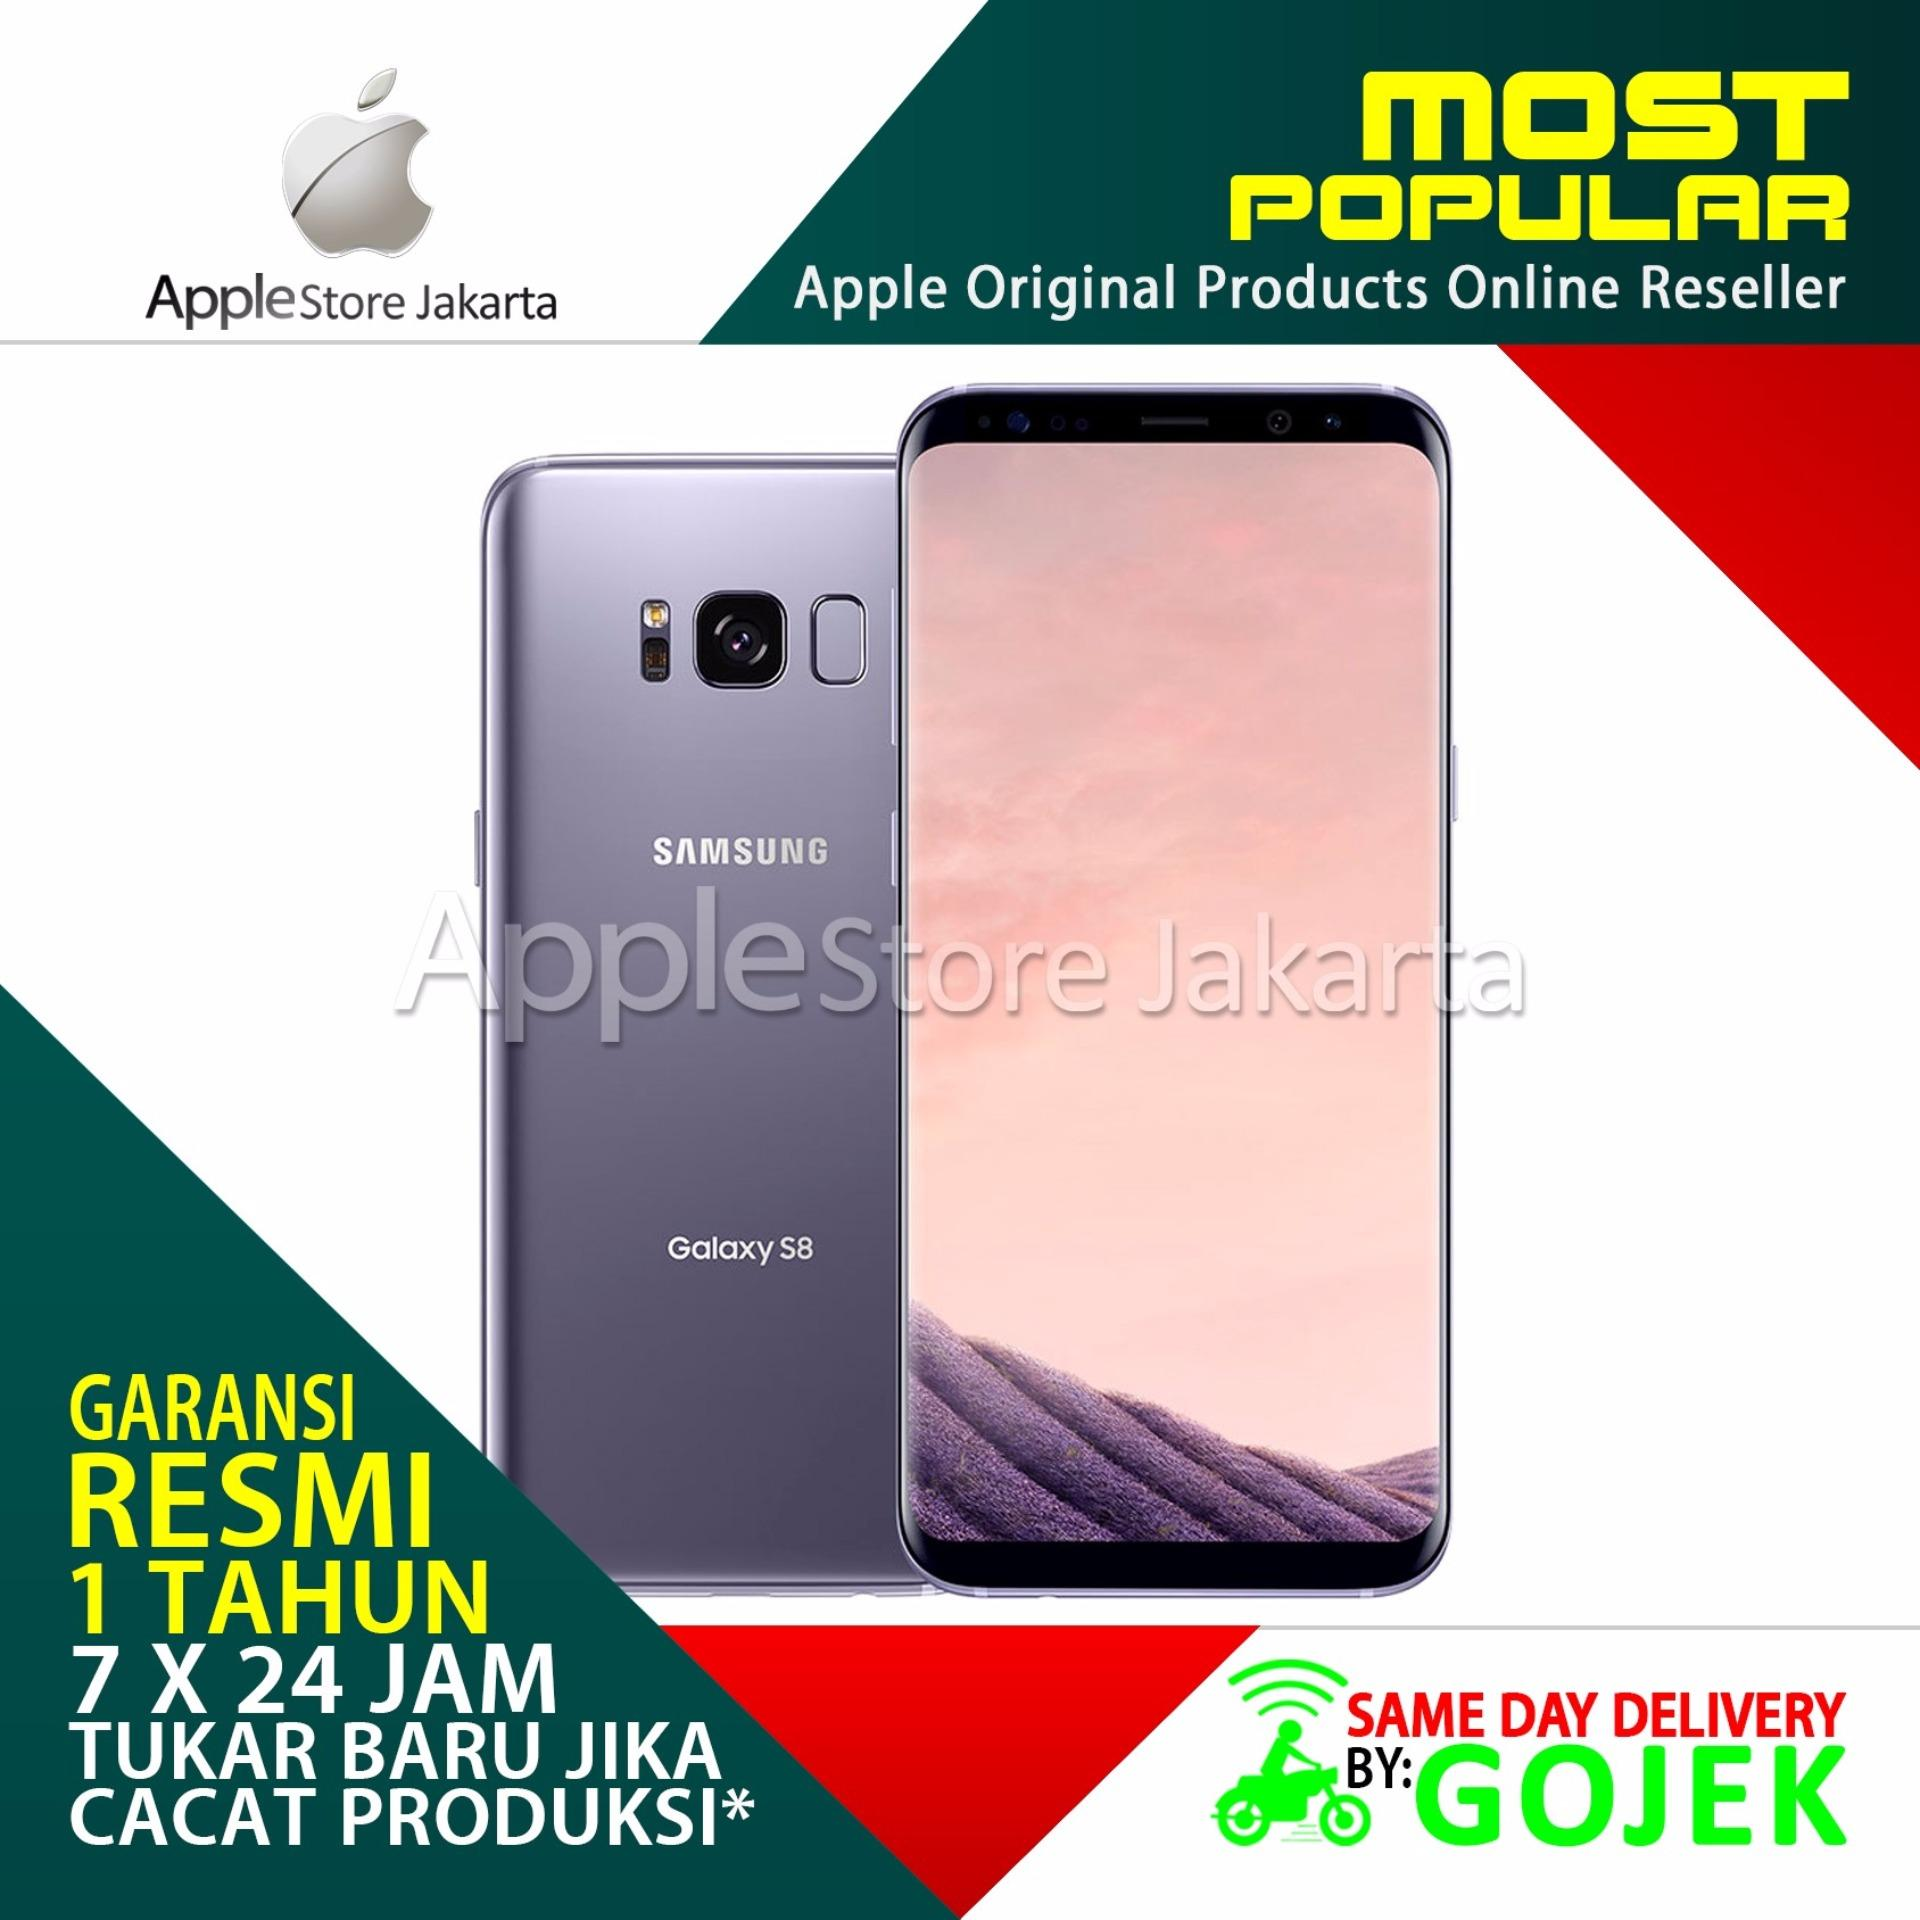 Samsung Galaxy S8 Smartphone Garansi Resmi Orchid Gray 64gb 4gb Dual Sein Plus 4g Lte